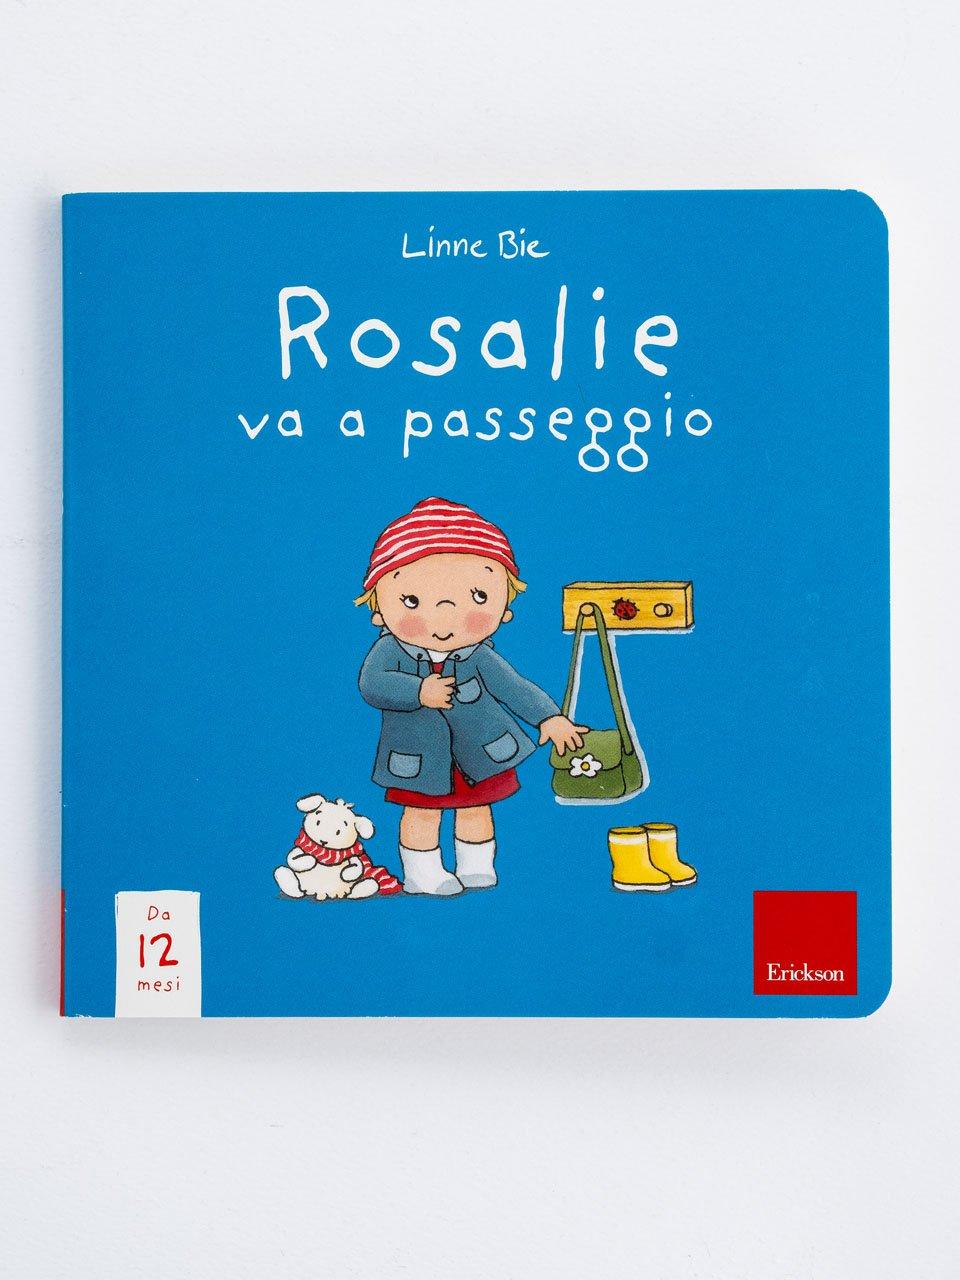 Rosalie va a passeggio - Libri - Erickson